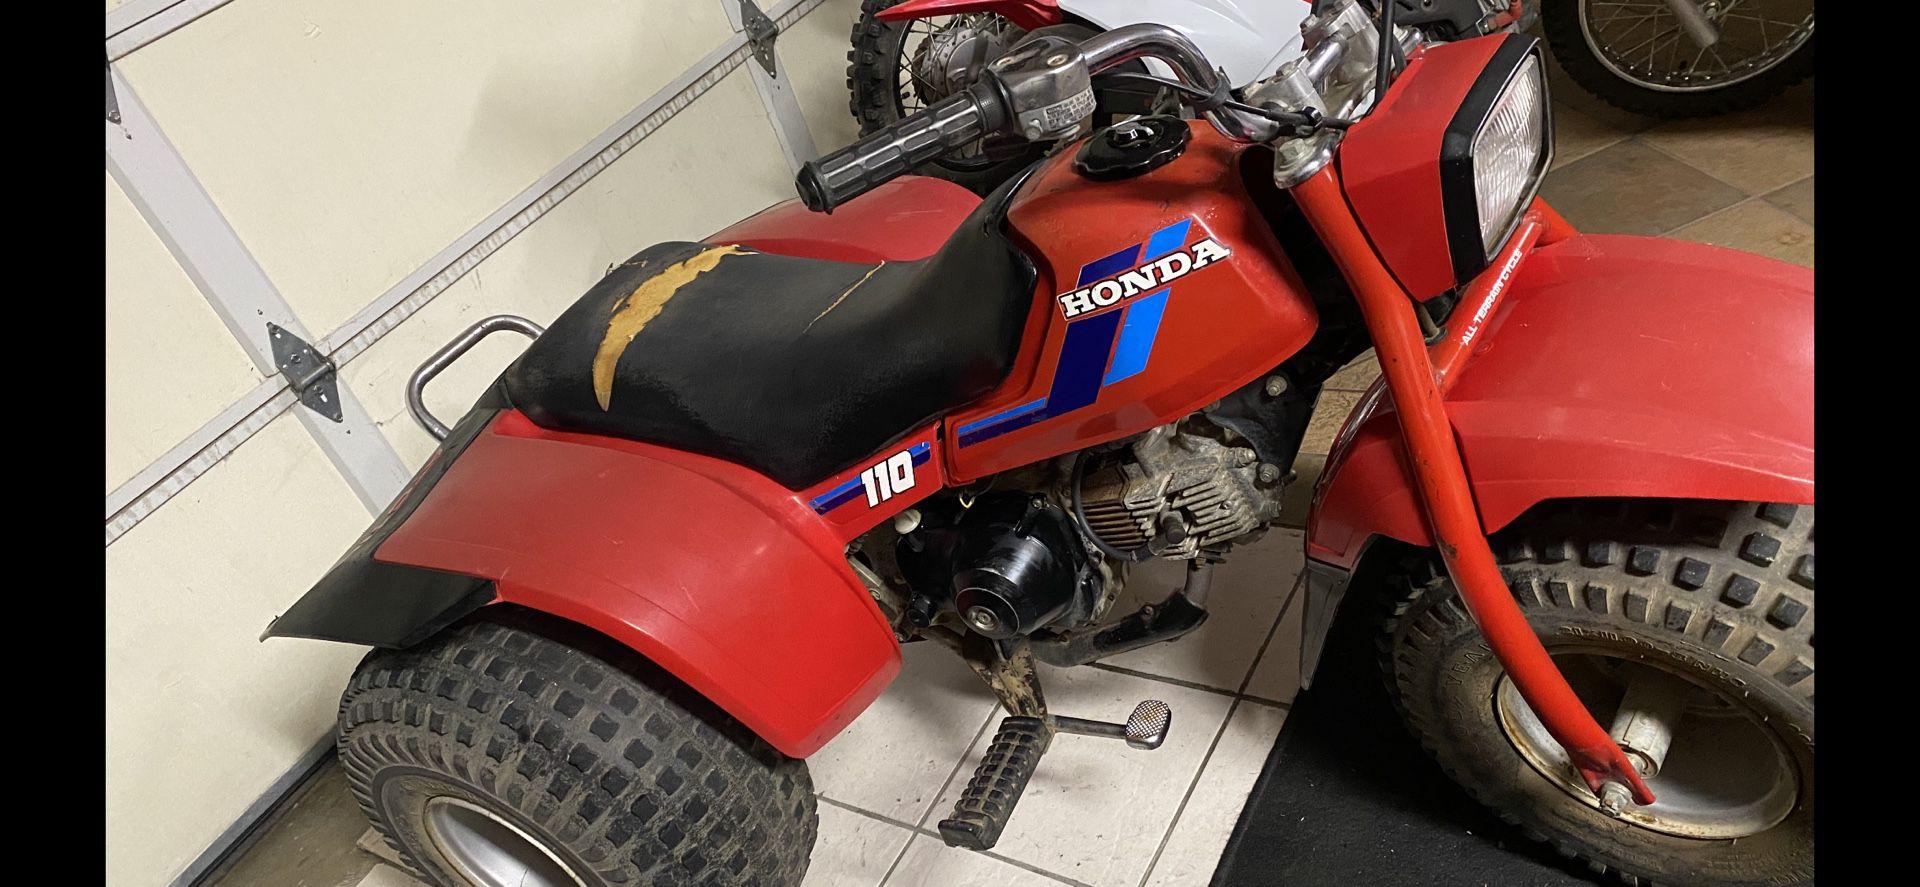 Photo 1986 Honda 110 three wheeler no title runs